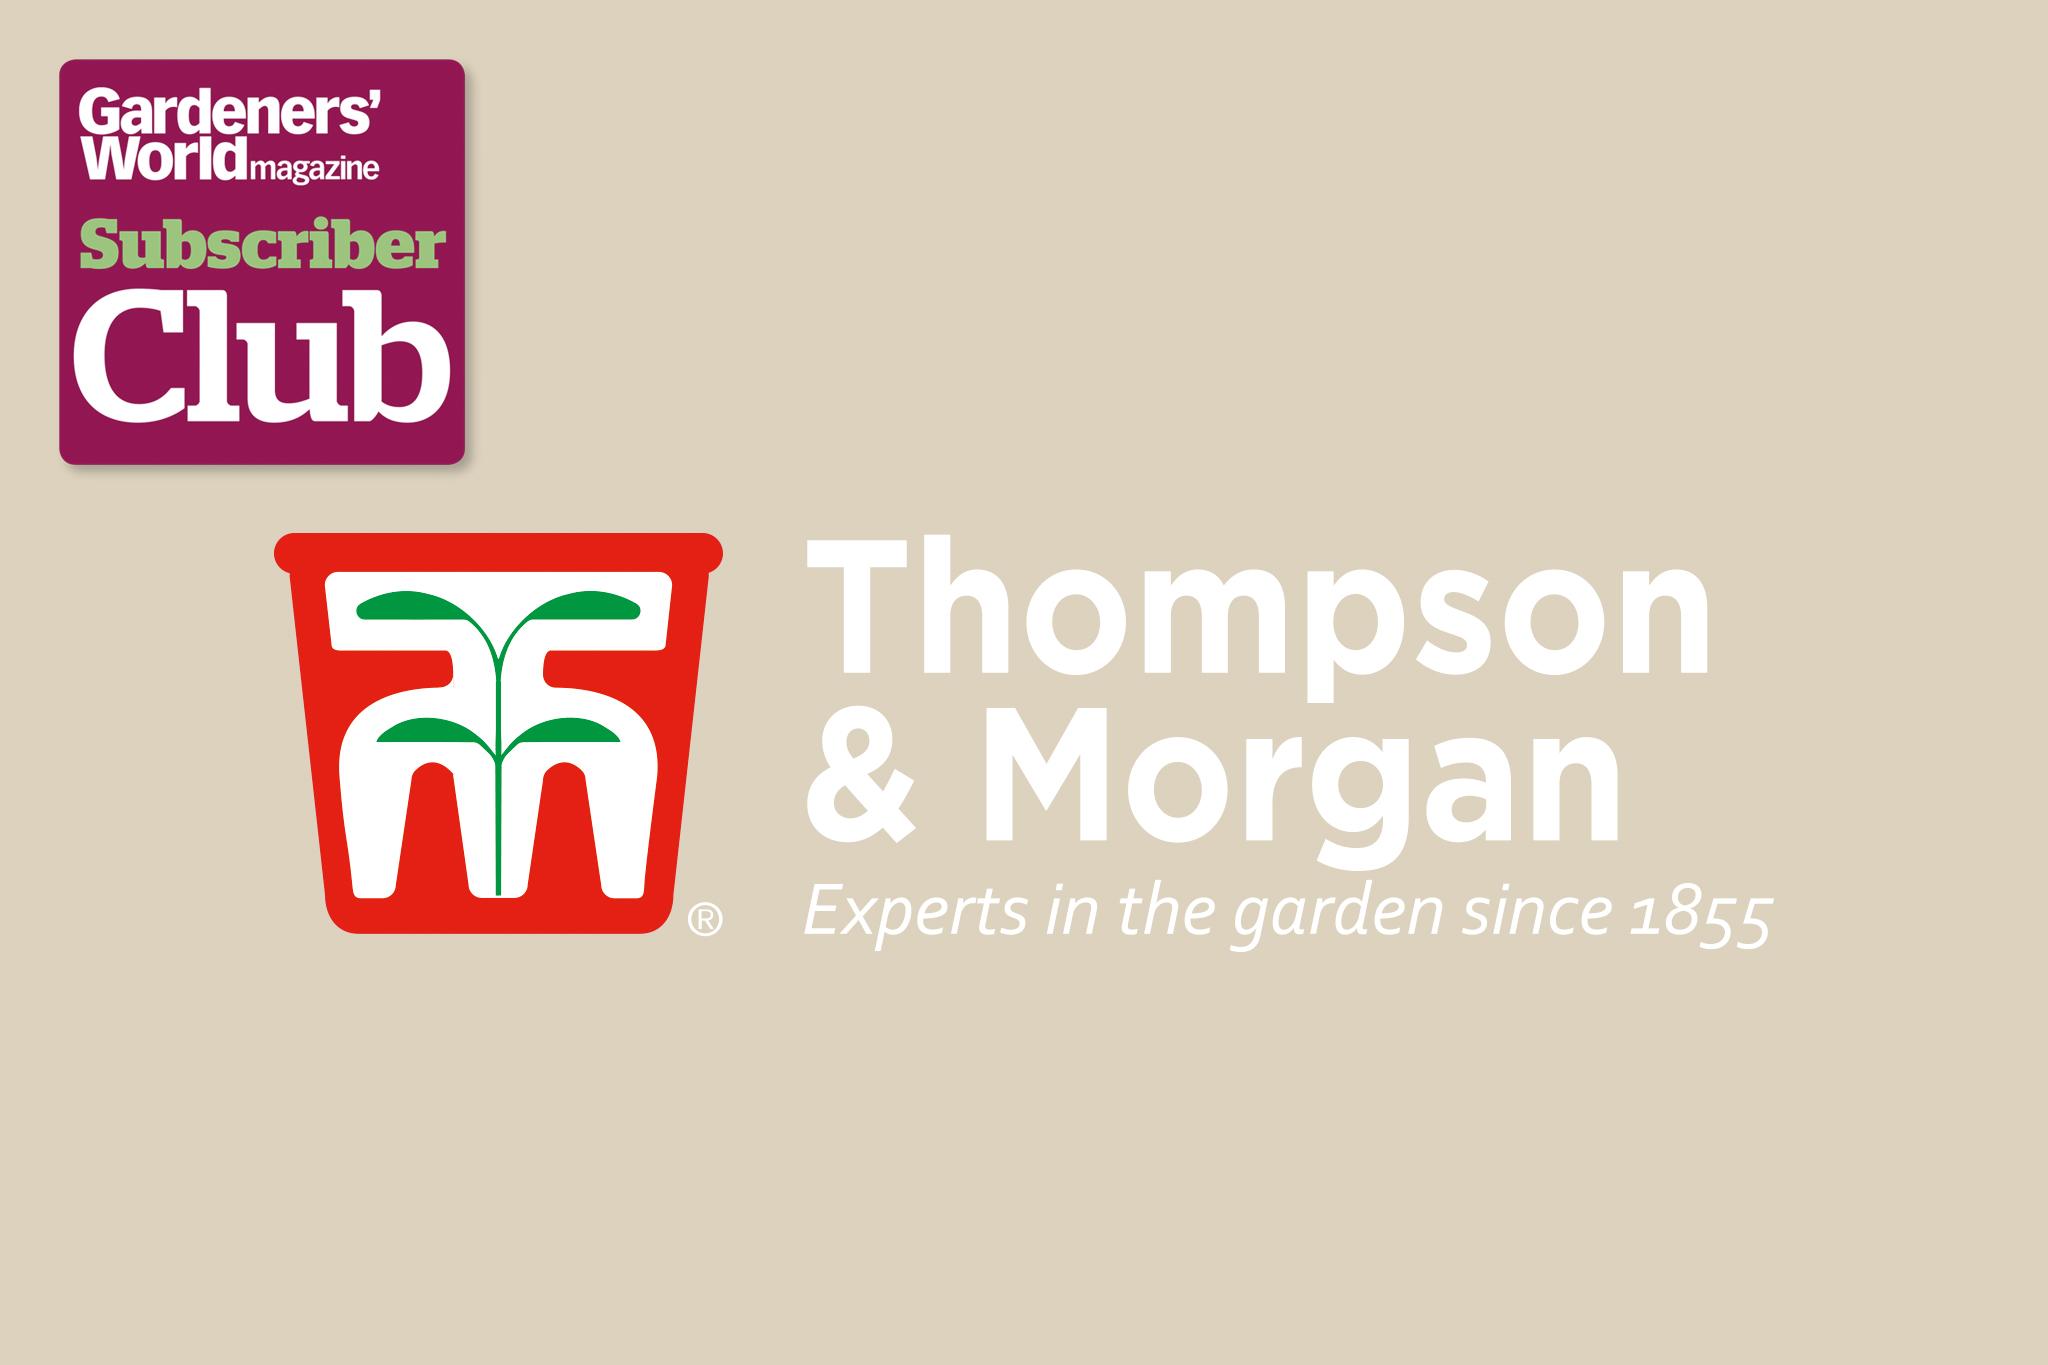 Thompson & Morgan BBC Gardeners' World Magazine Subscriber Club discount